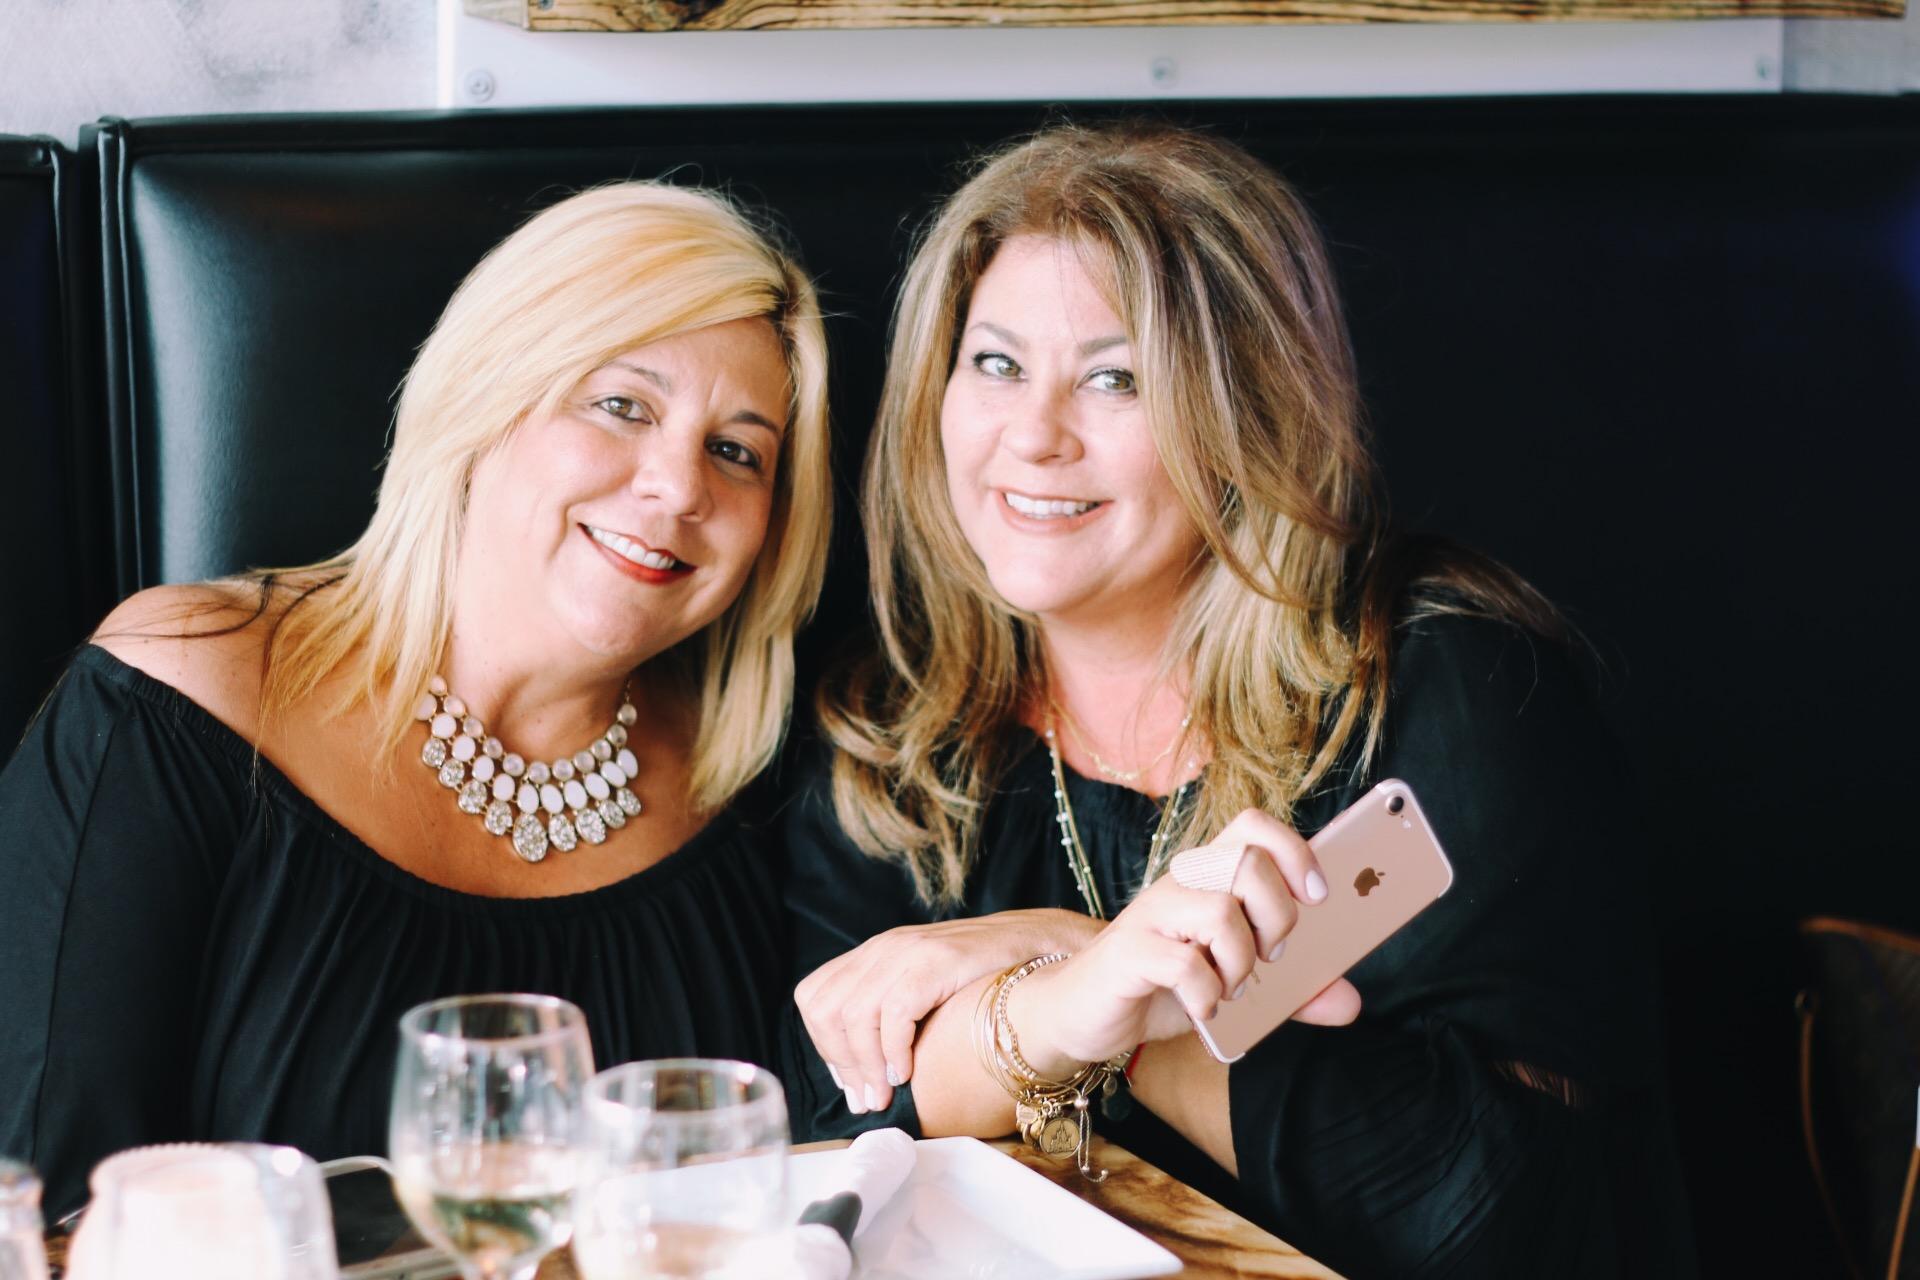 Women Who Wine-Uncorked Conversations-Eat Greek-Miami Wine Events-Wine Tasting Miami-15.jpg